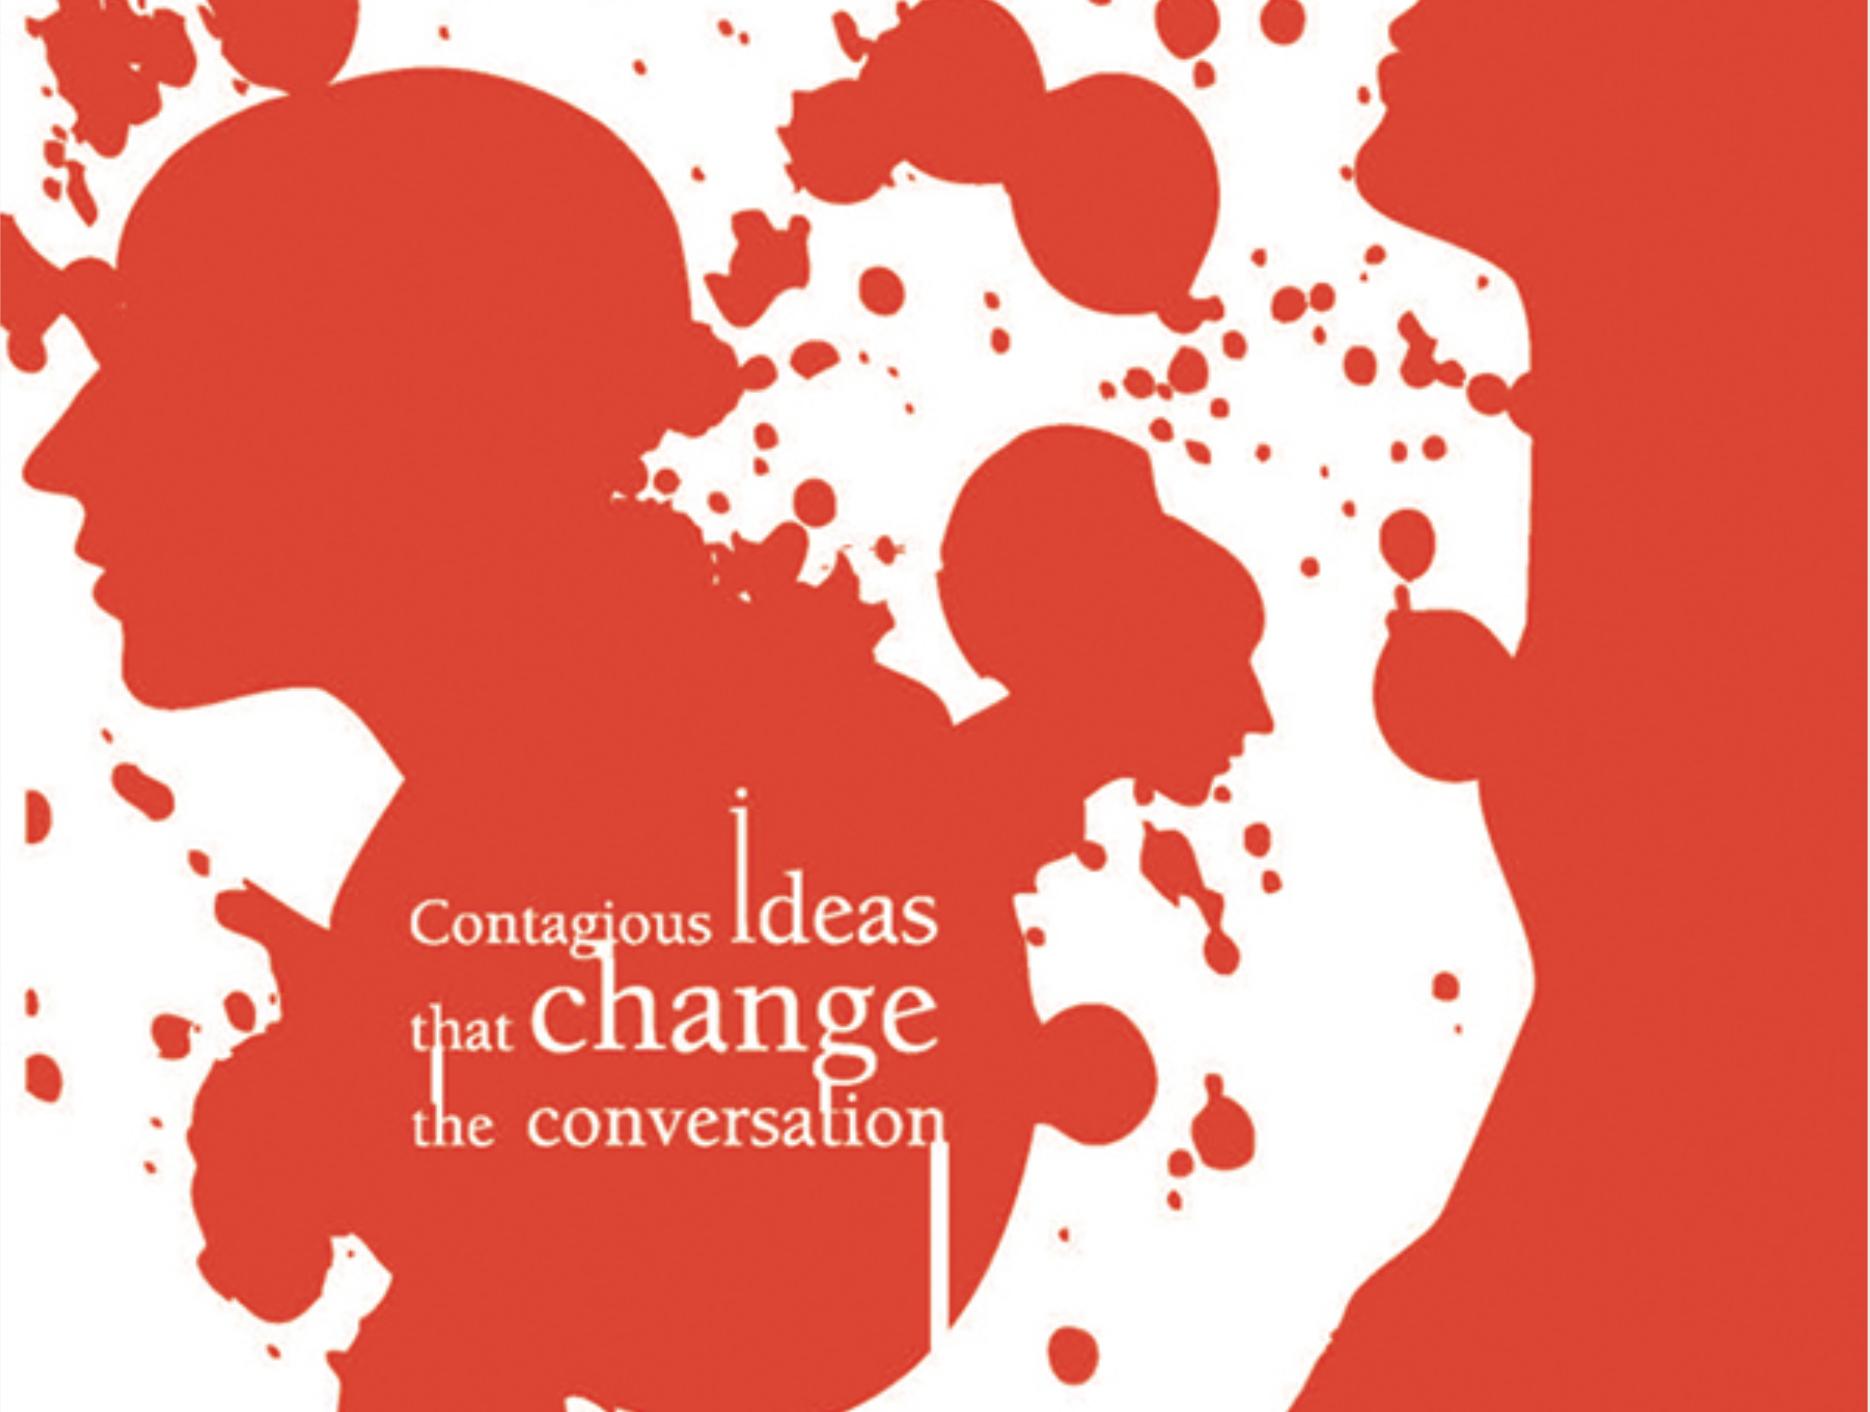 Contagious ideas that change the conversation